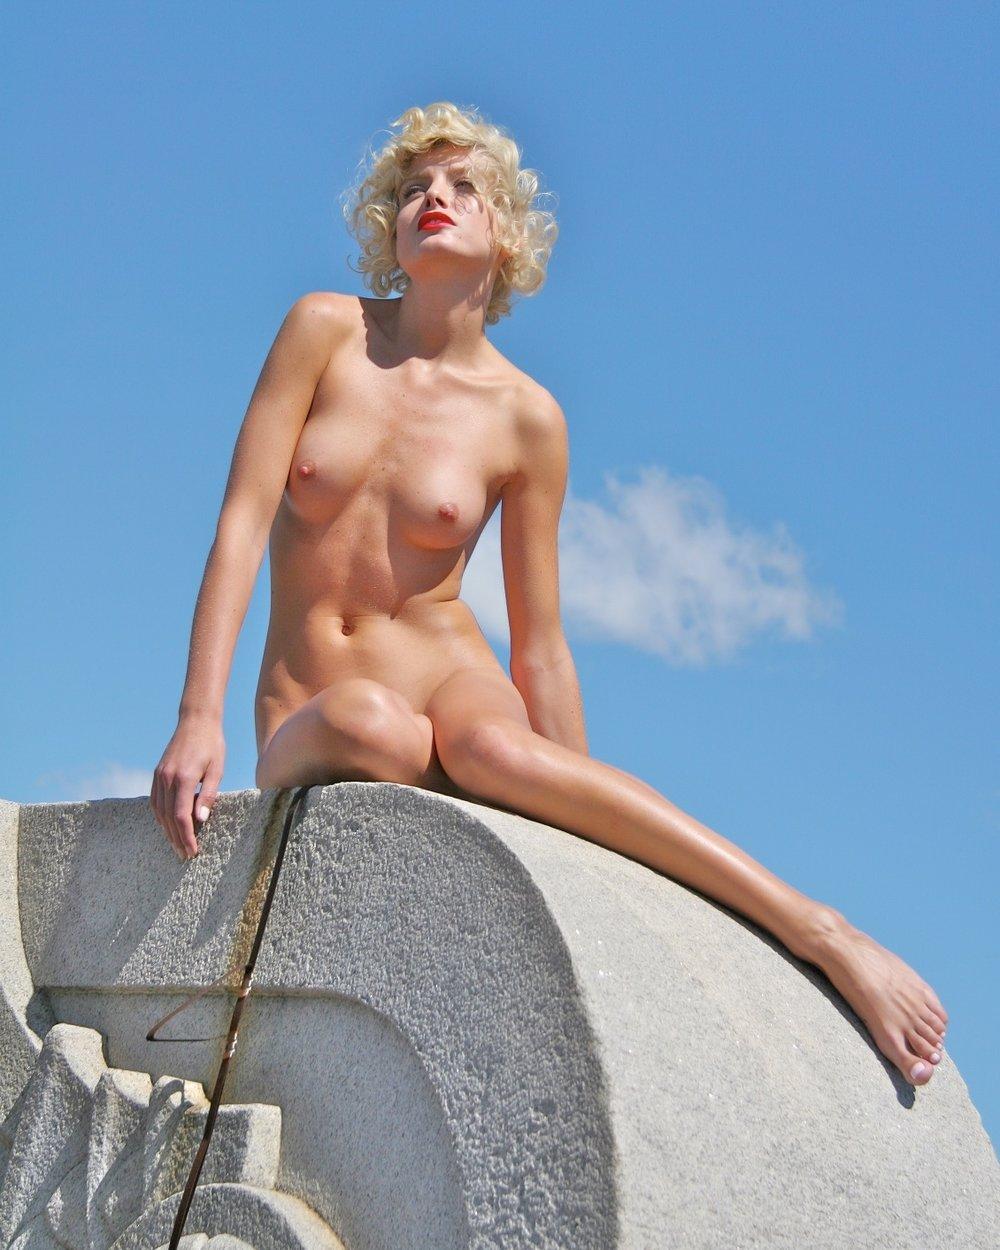 Beauty-Editorial 034 10-27-452007-07-01.jpg